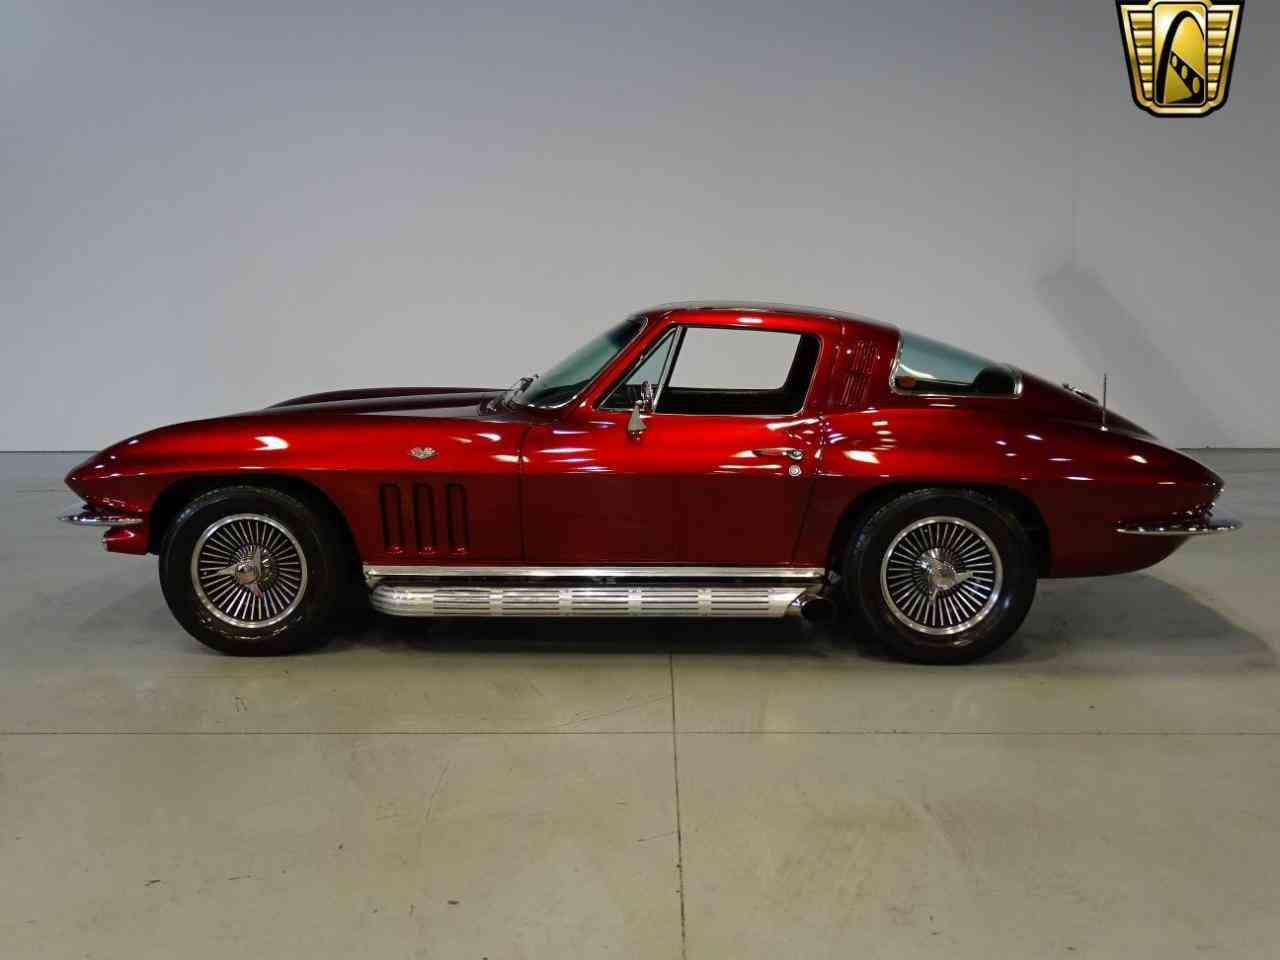 Large Picture of '65 Corvette - $74,000.00 - KKM4